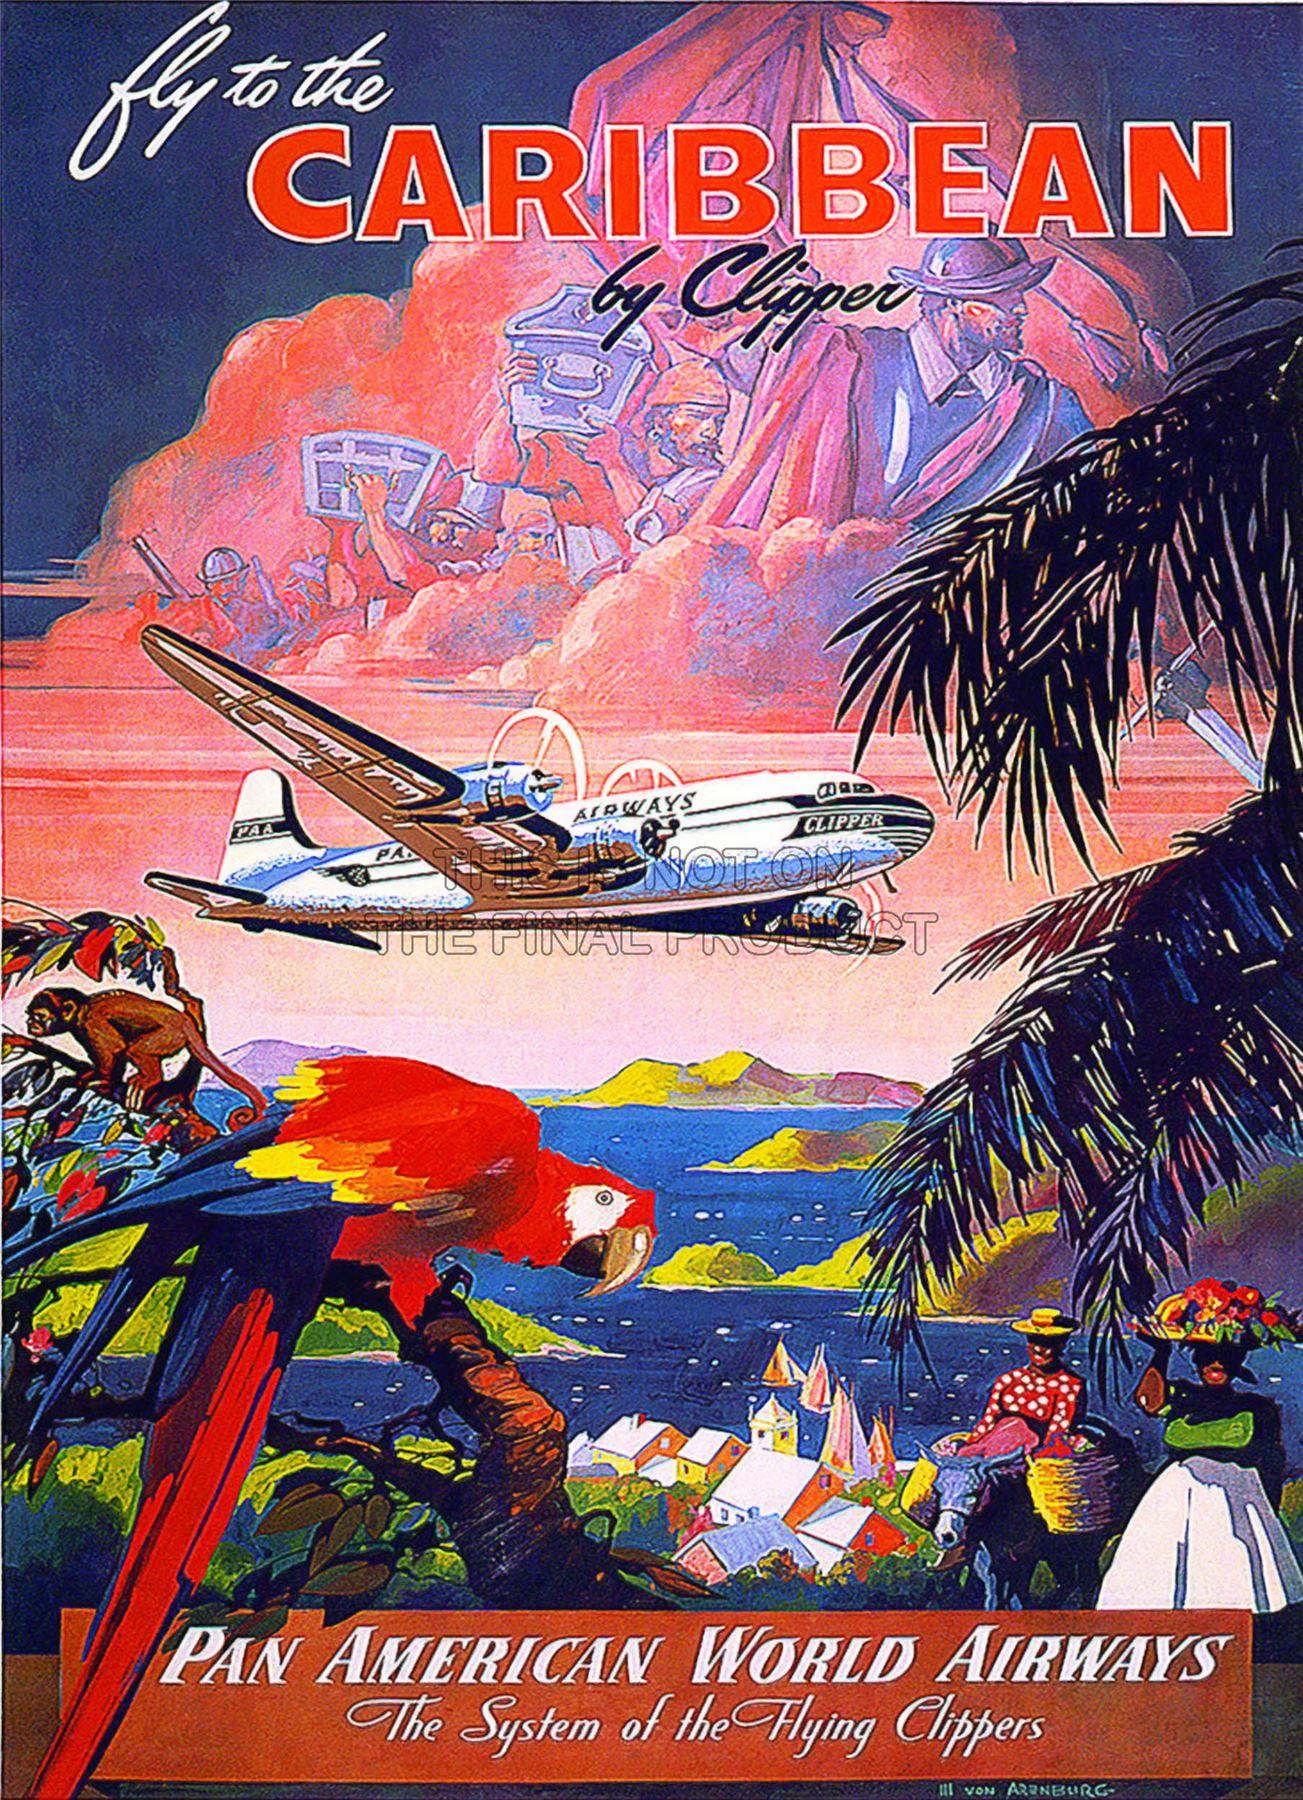 Vintage Pan Am Carribean Travel Poster A3 Print